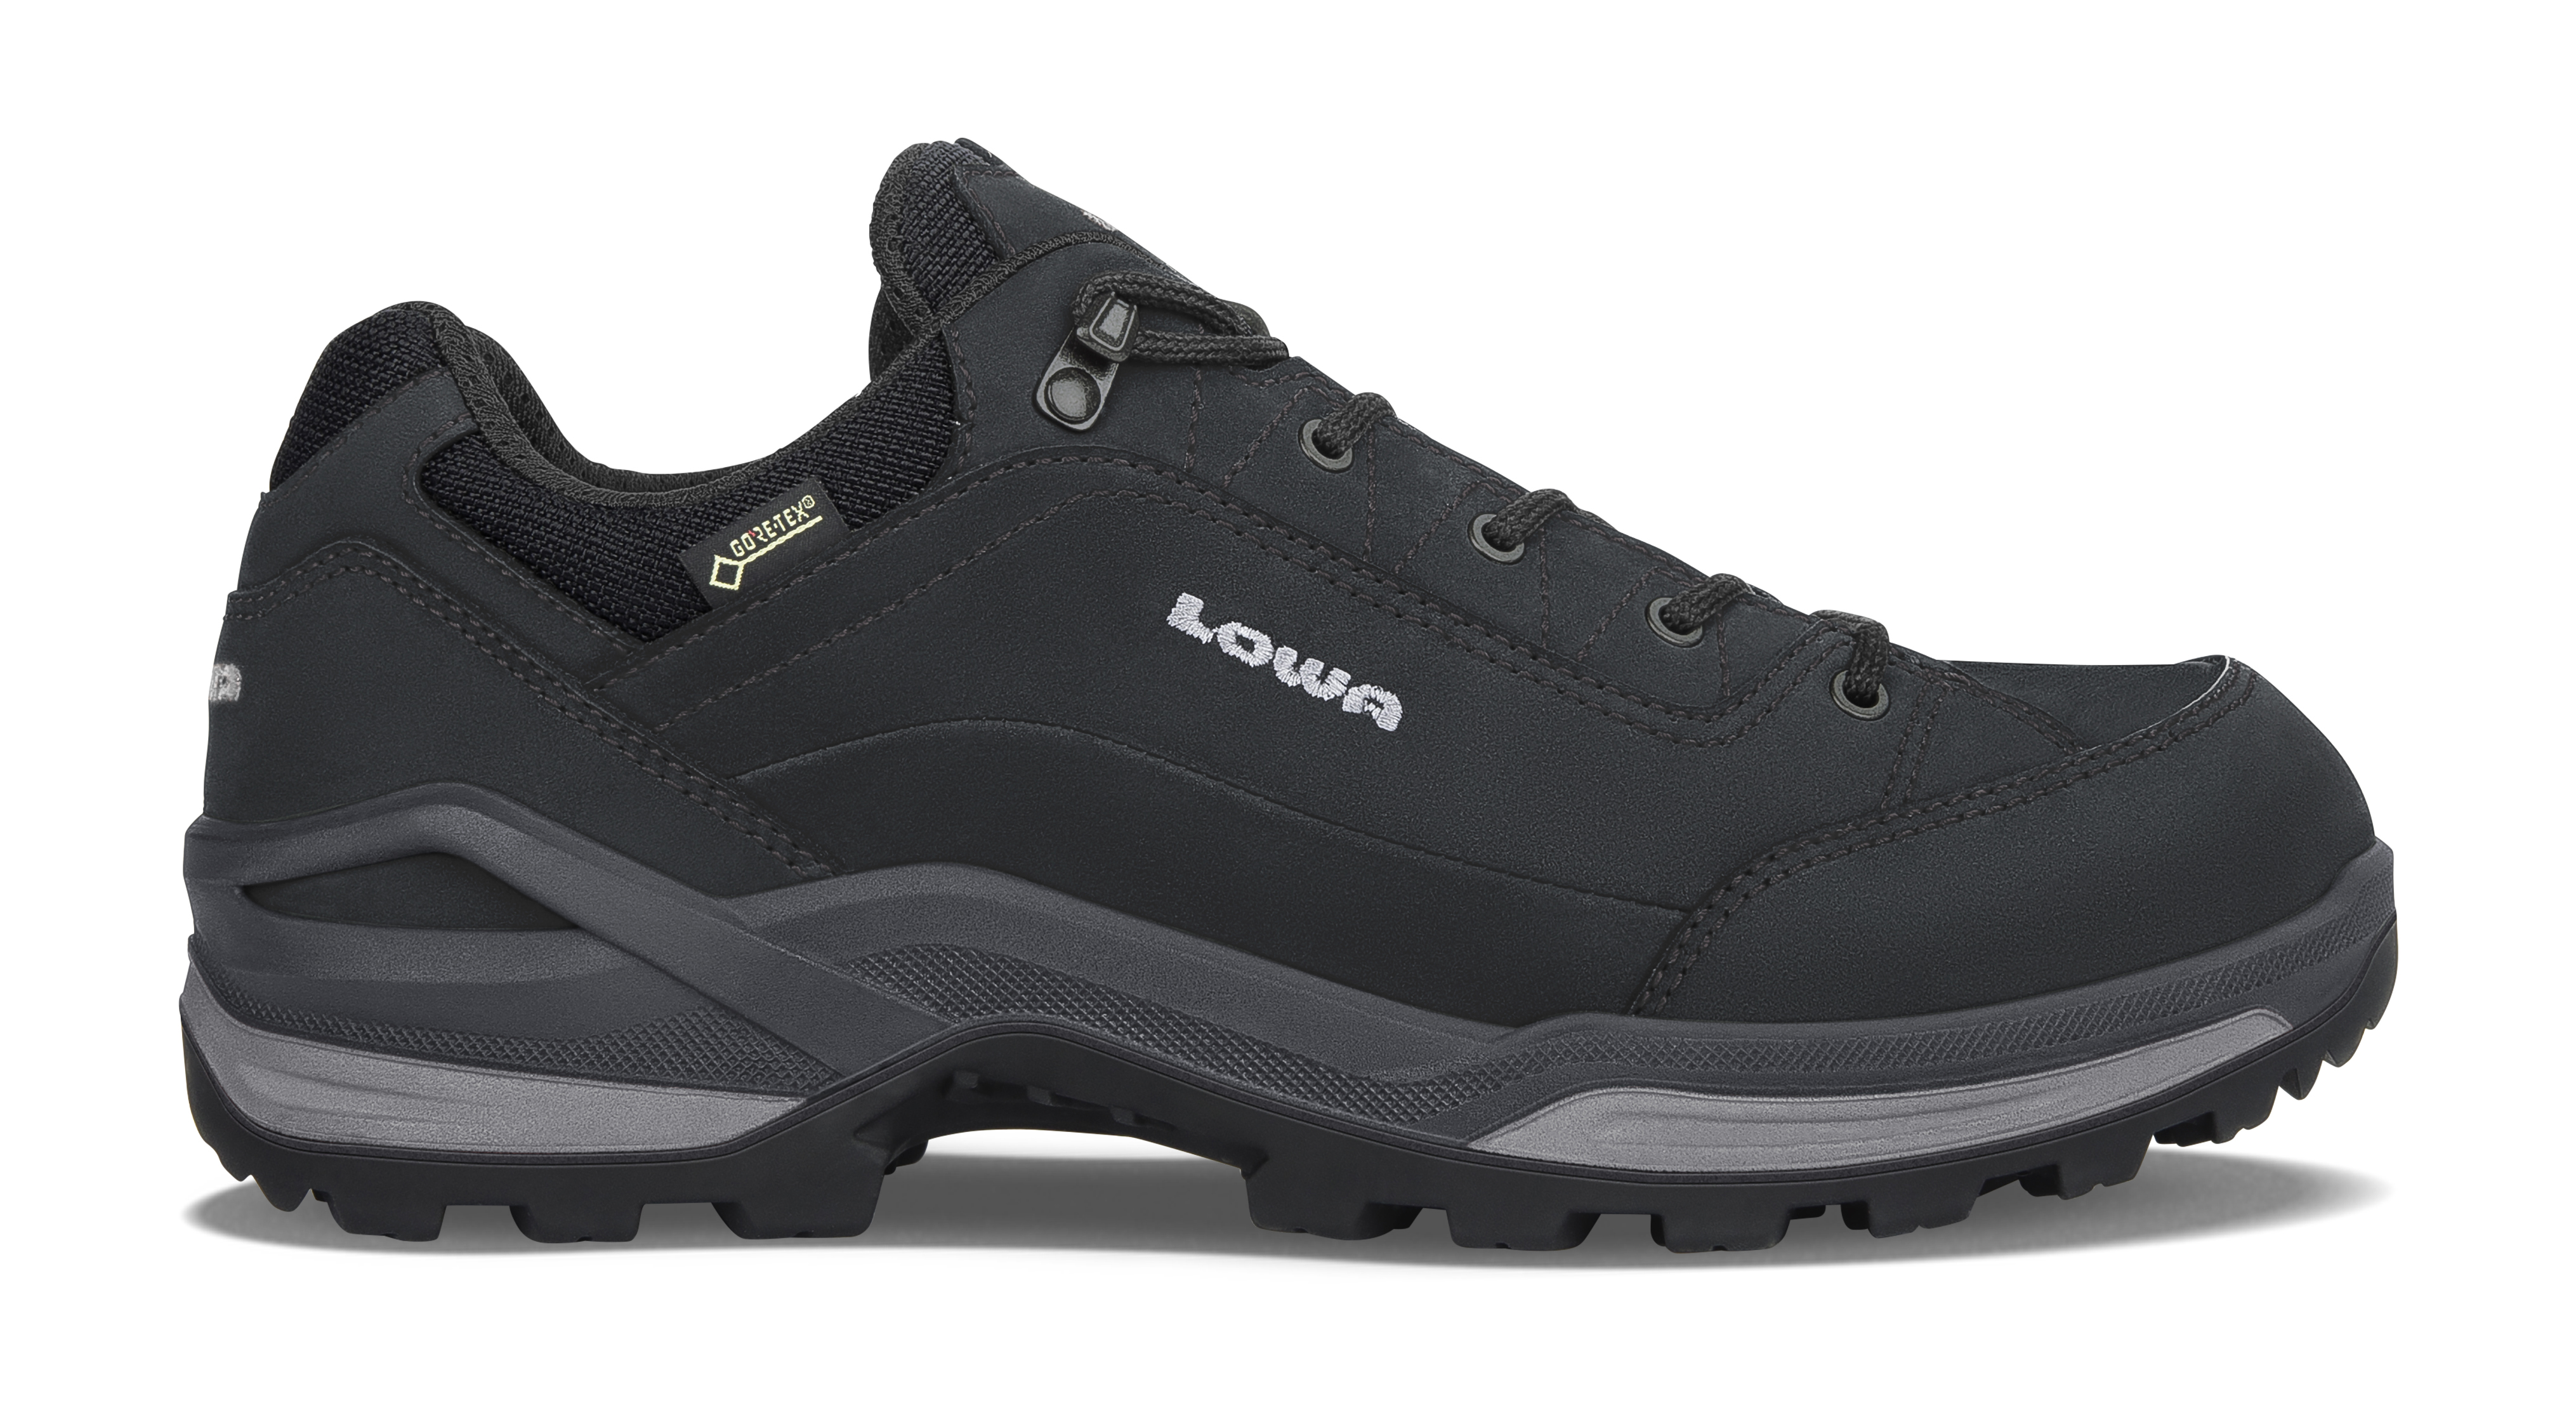 Lowa Renegade GTX® Low - Chaussures randonnée homme